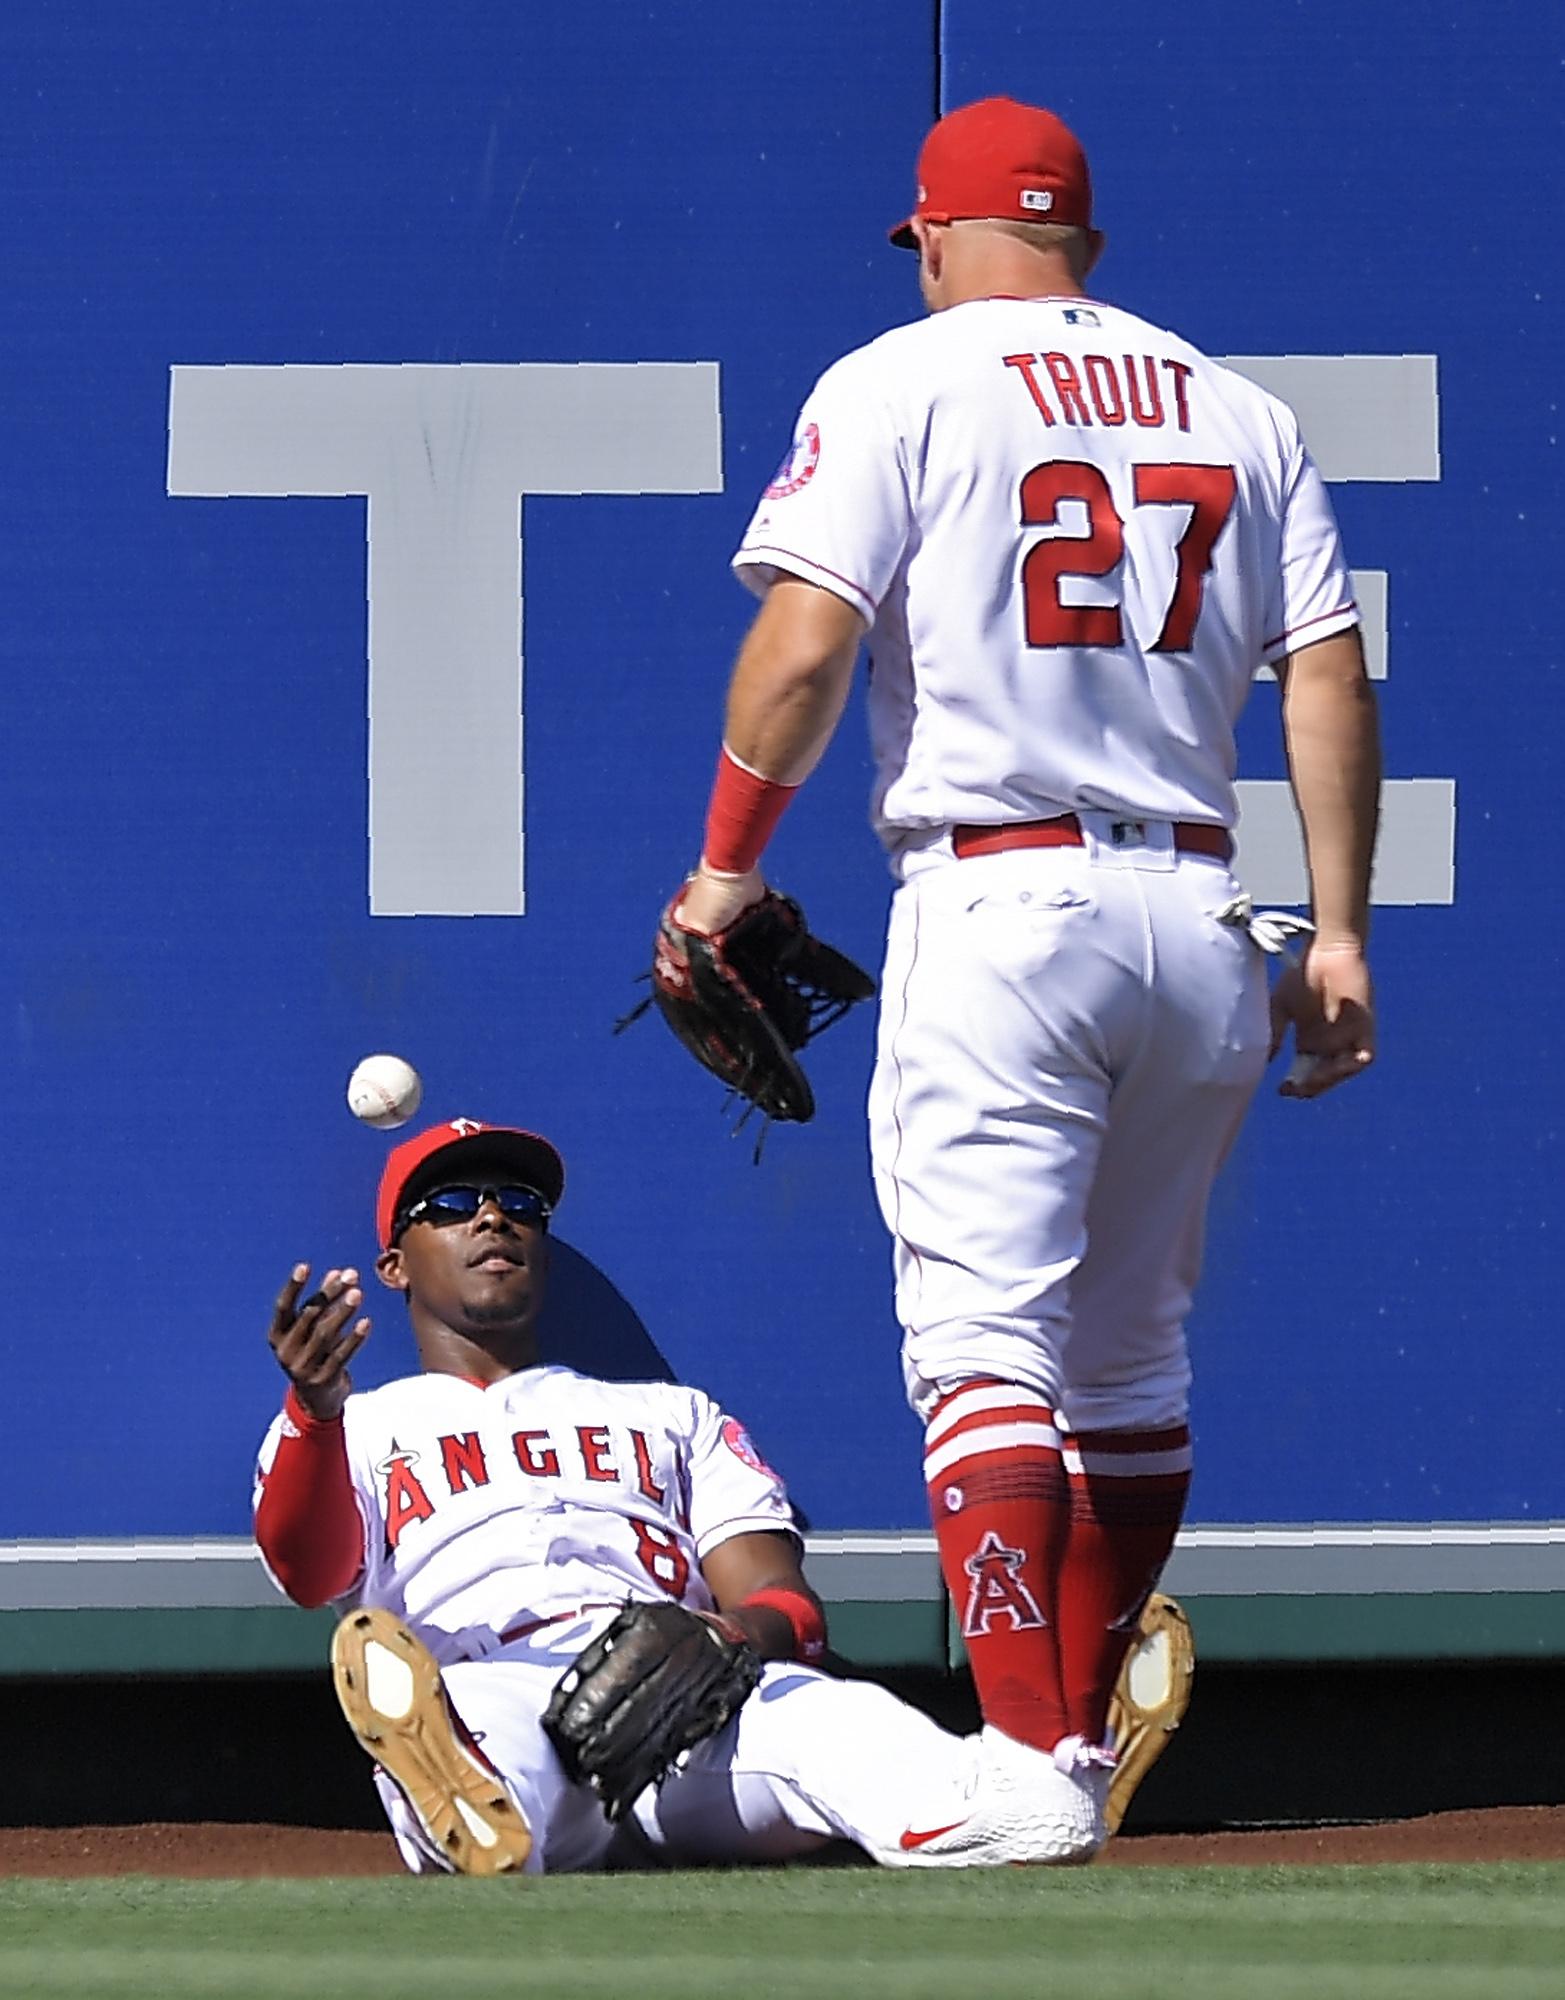 Copy of Astros Angels Baseball